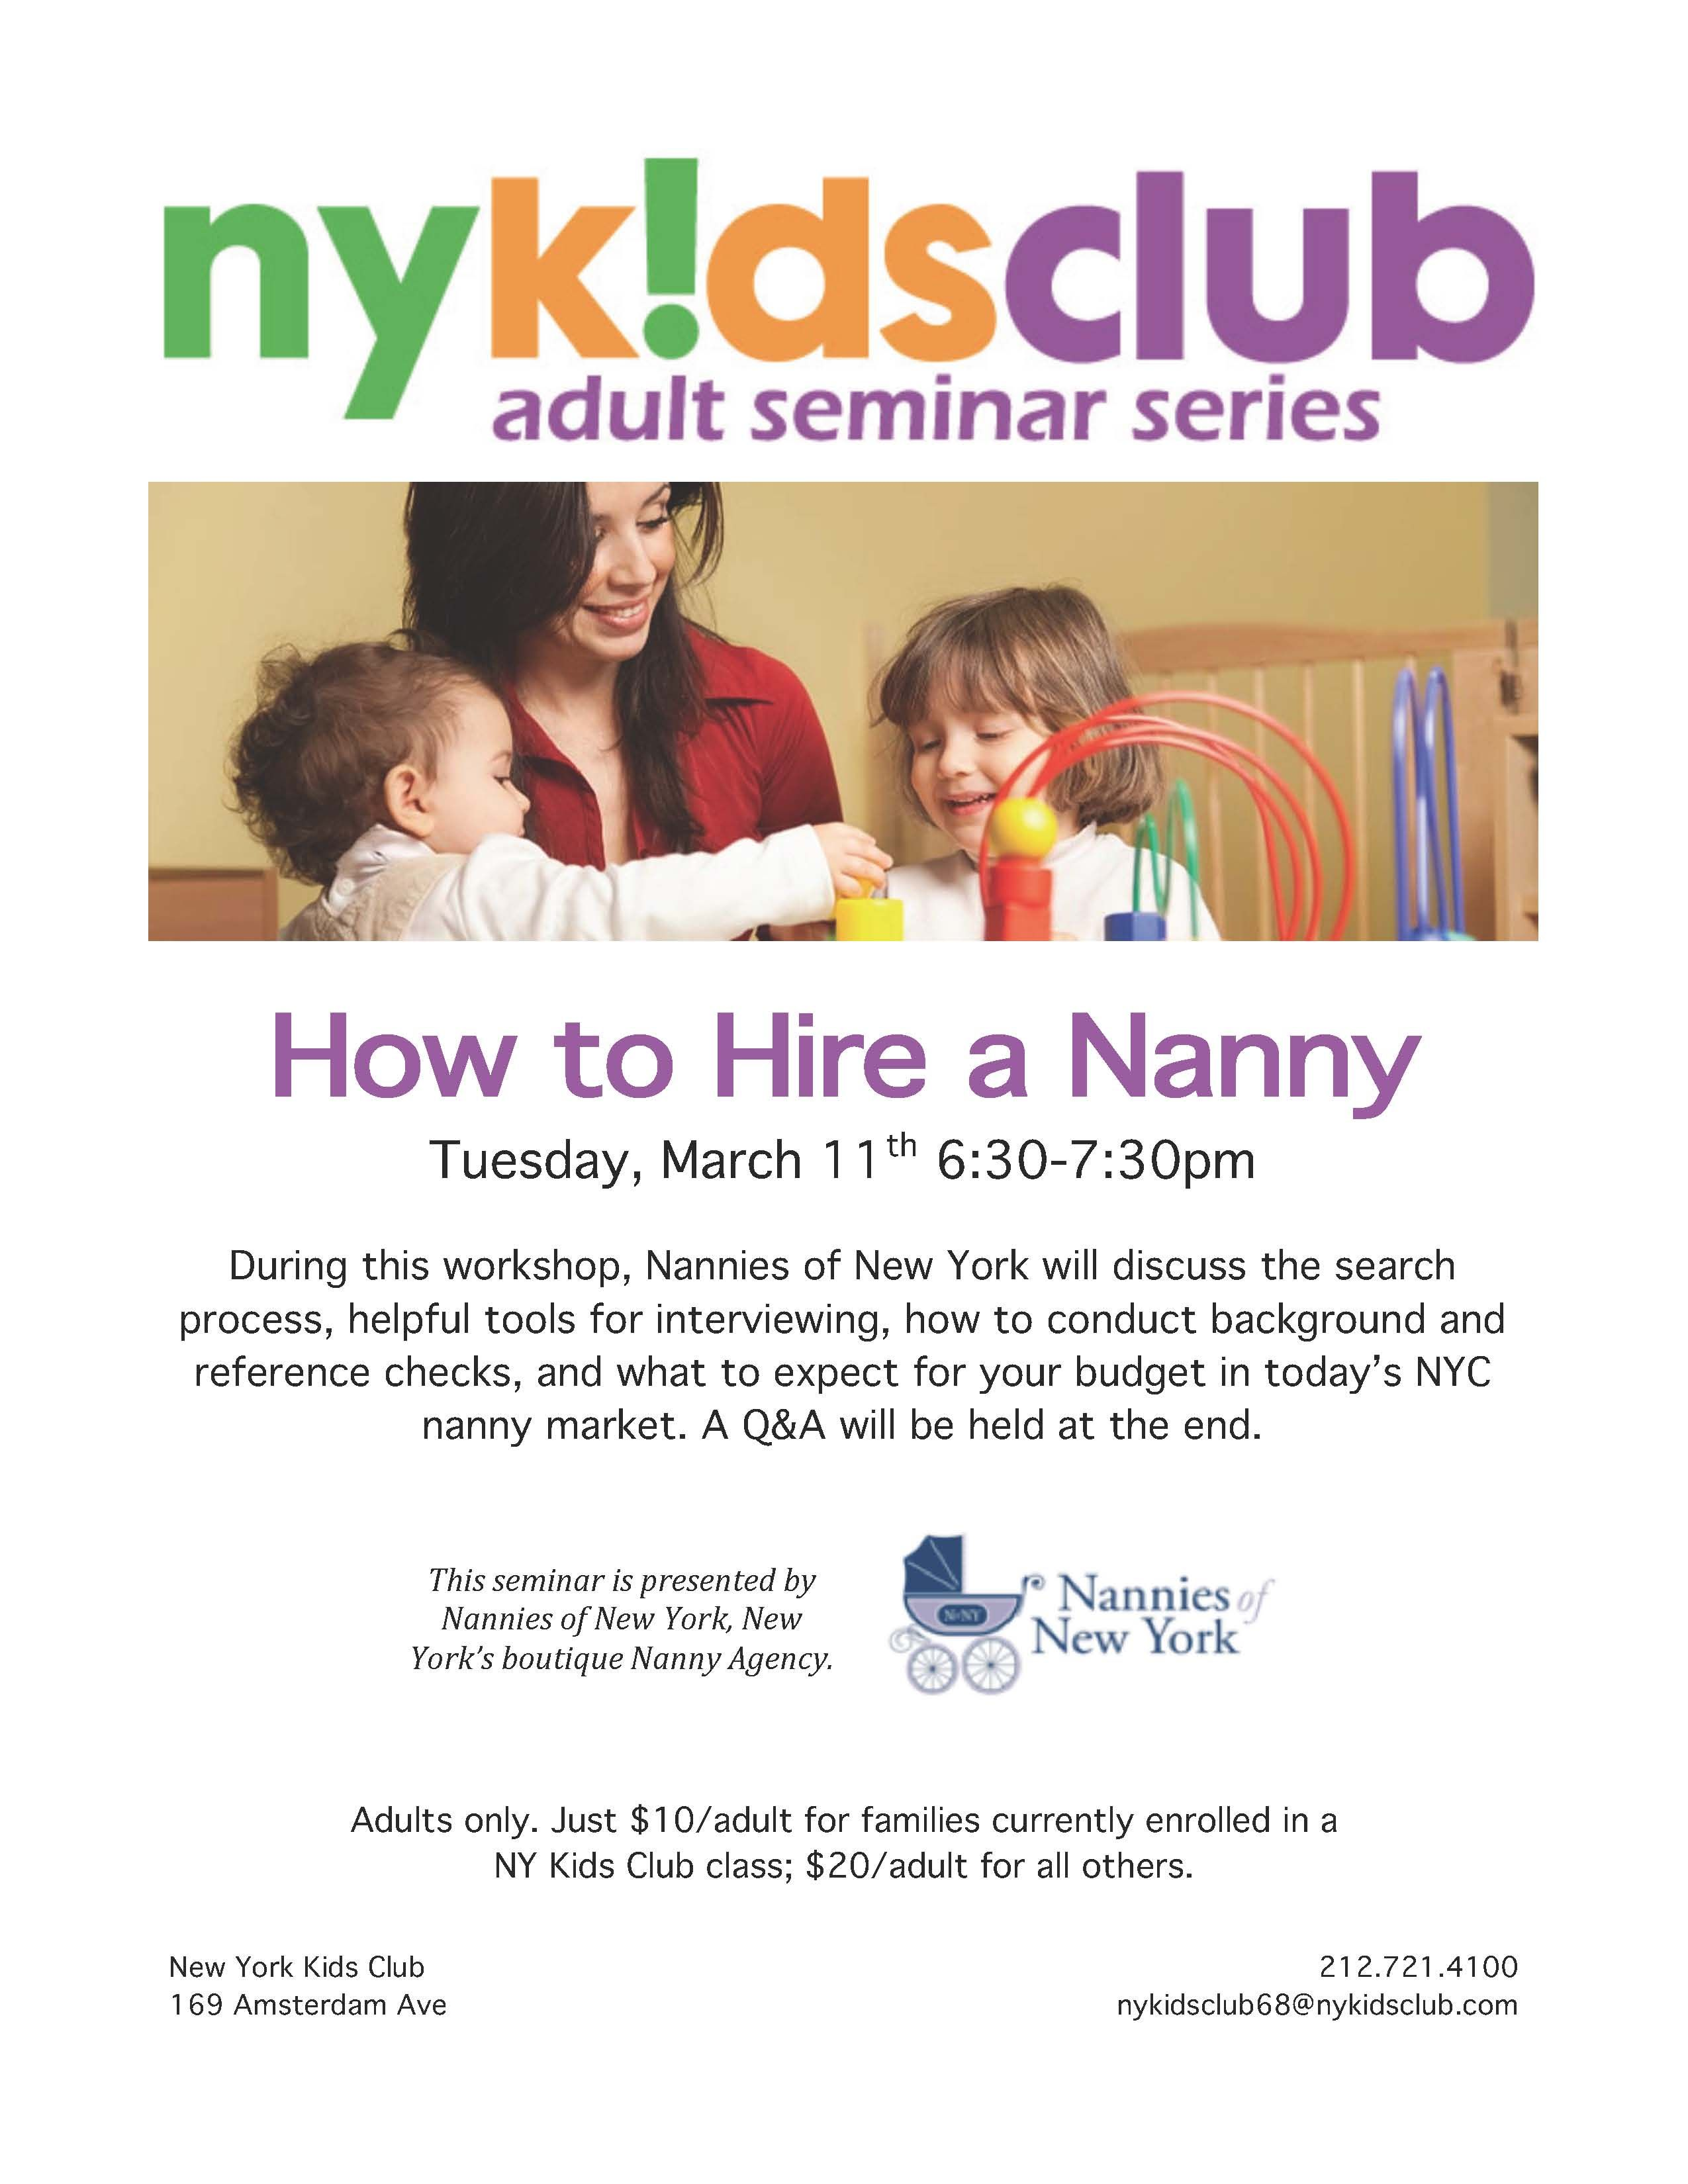 How To Hire A Nanny Workshop Workshop Budgeting Nanny